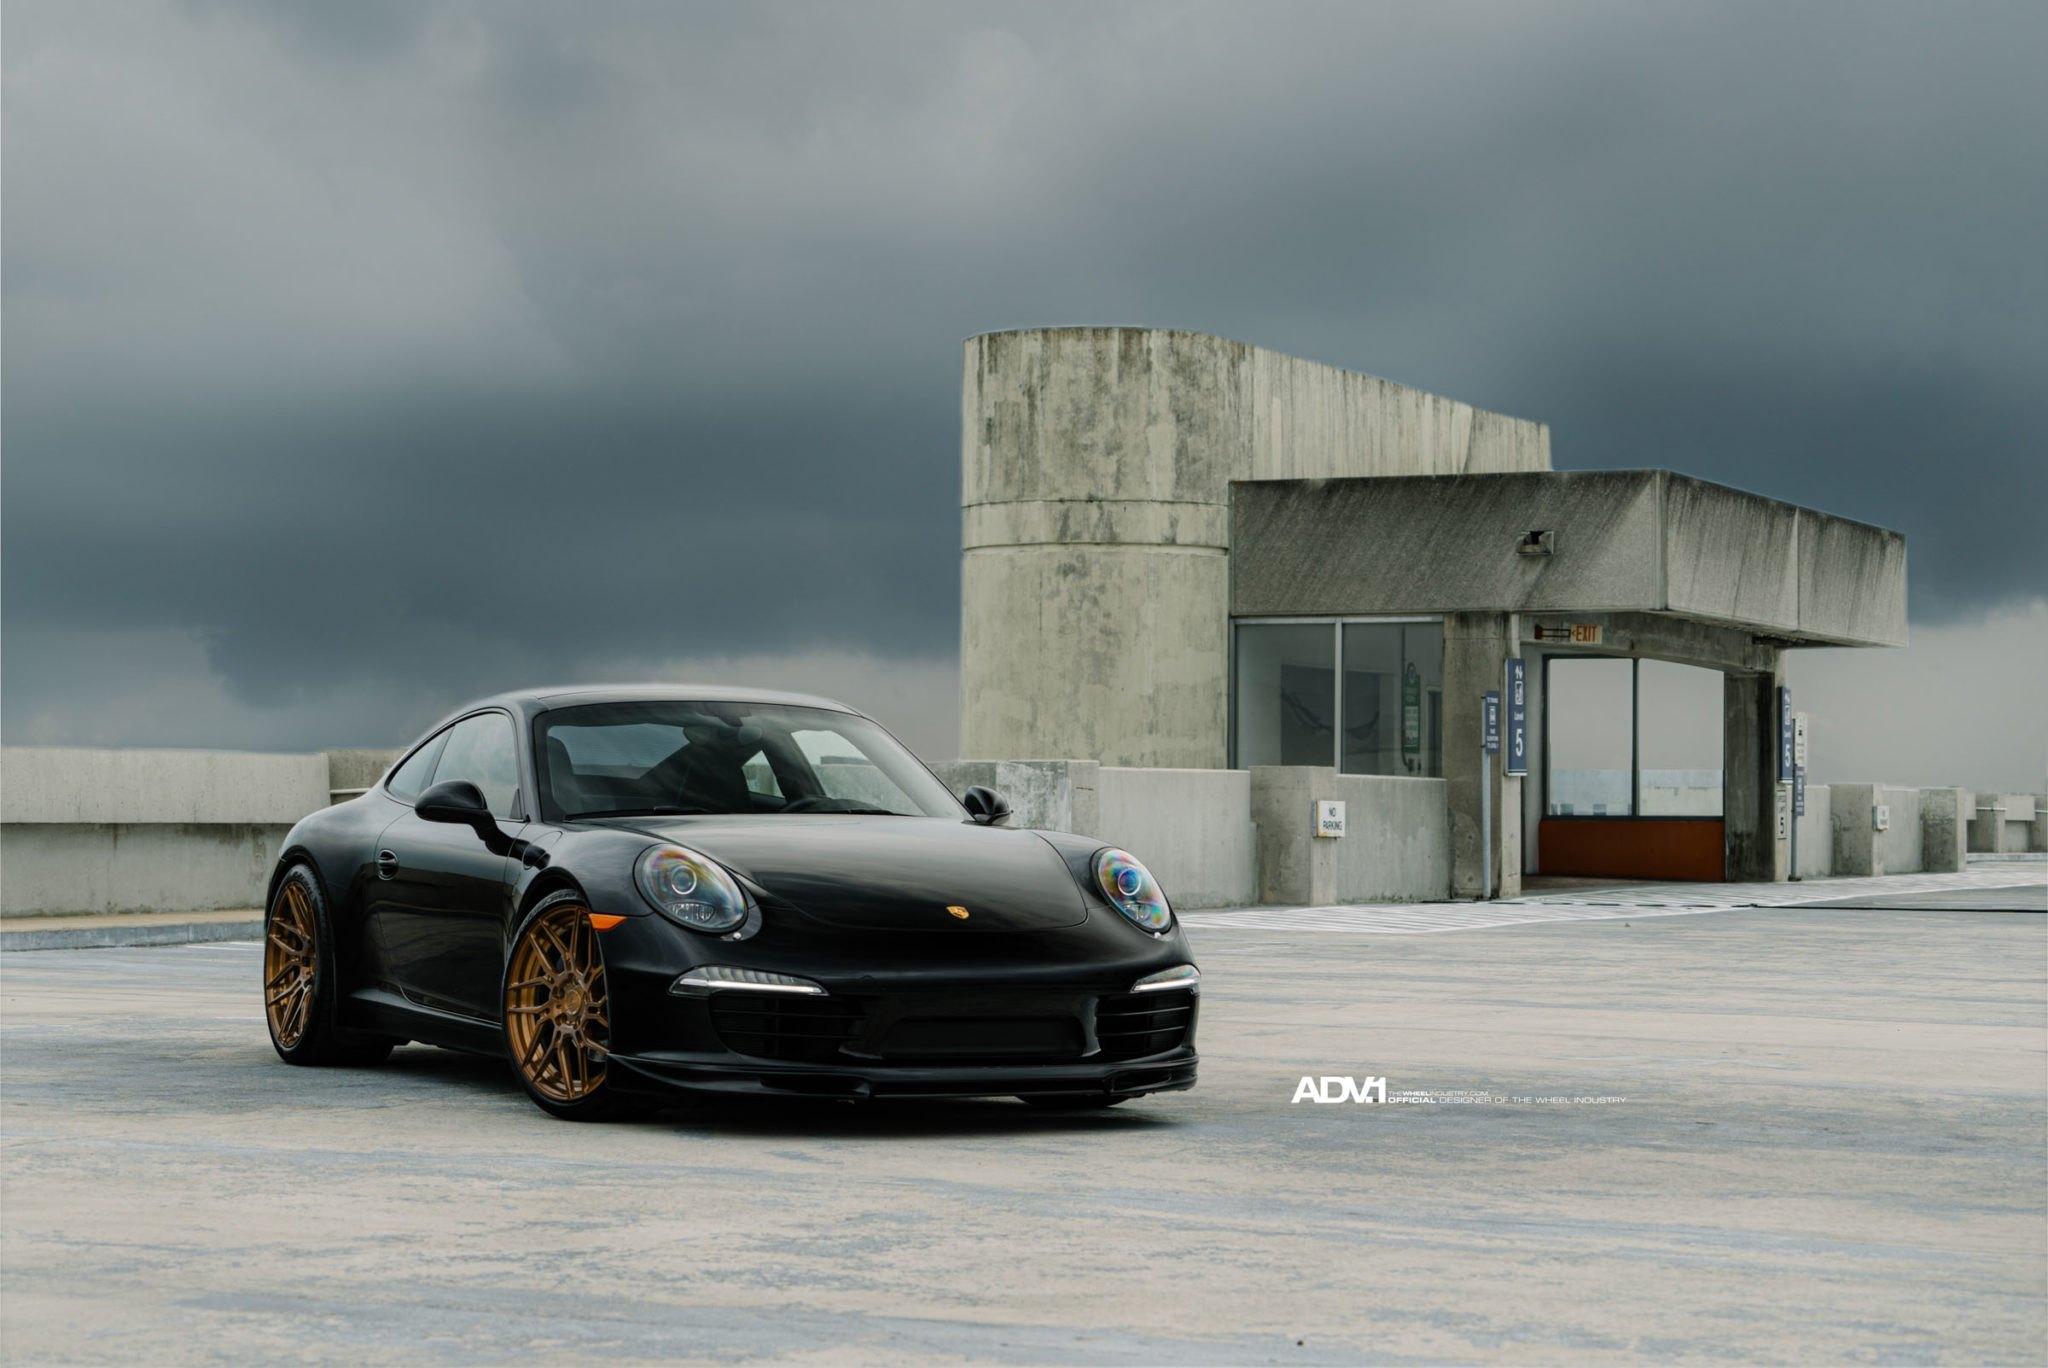 Clean Black Porsche 911 Carrera On Forged Custom Wheels Photo By Adv 1